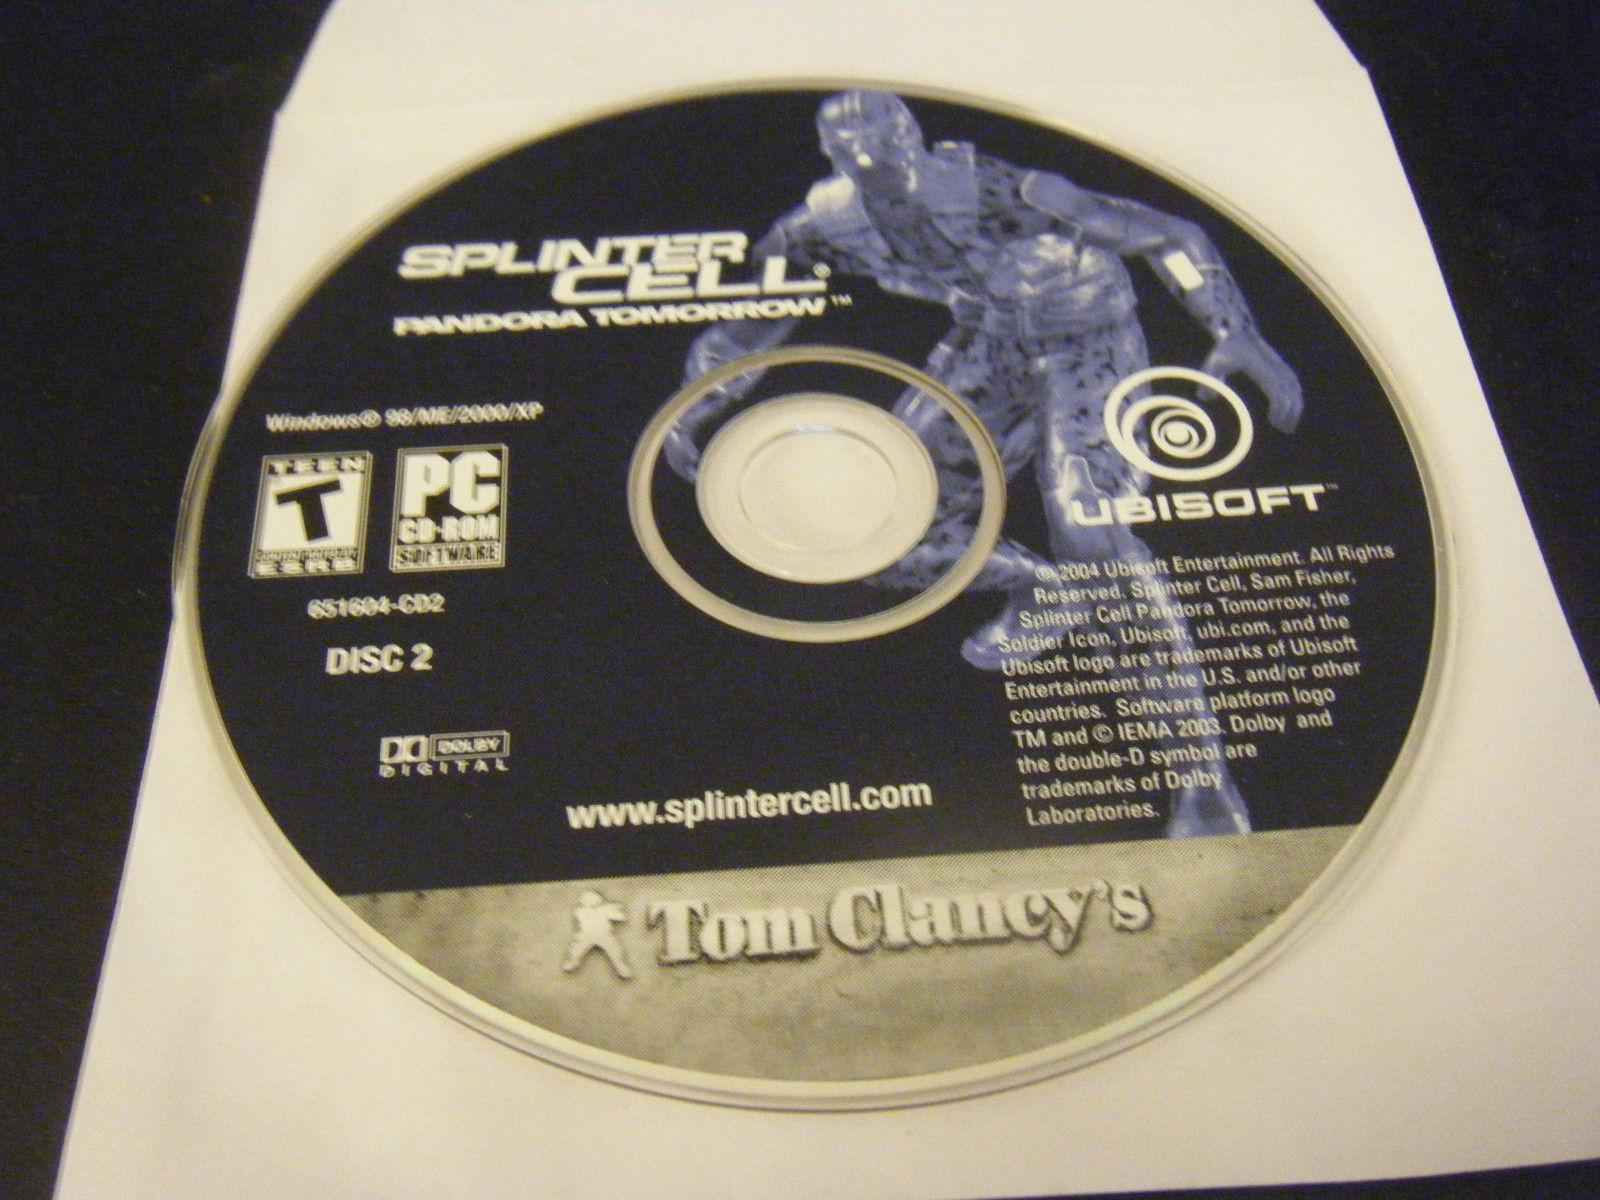 Tom Clancy's Splinter Cell: Pandora Tomorrow (PC, 2004) - Disc 2 Only